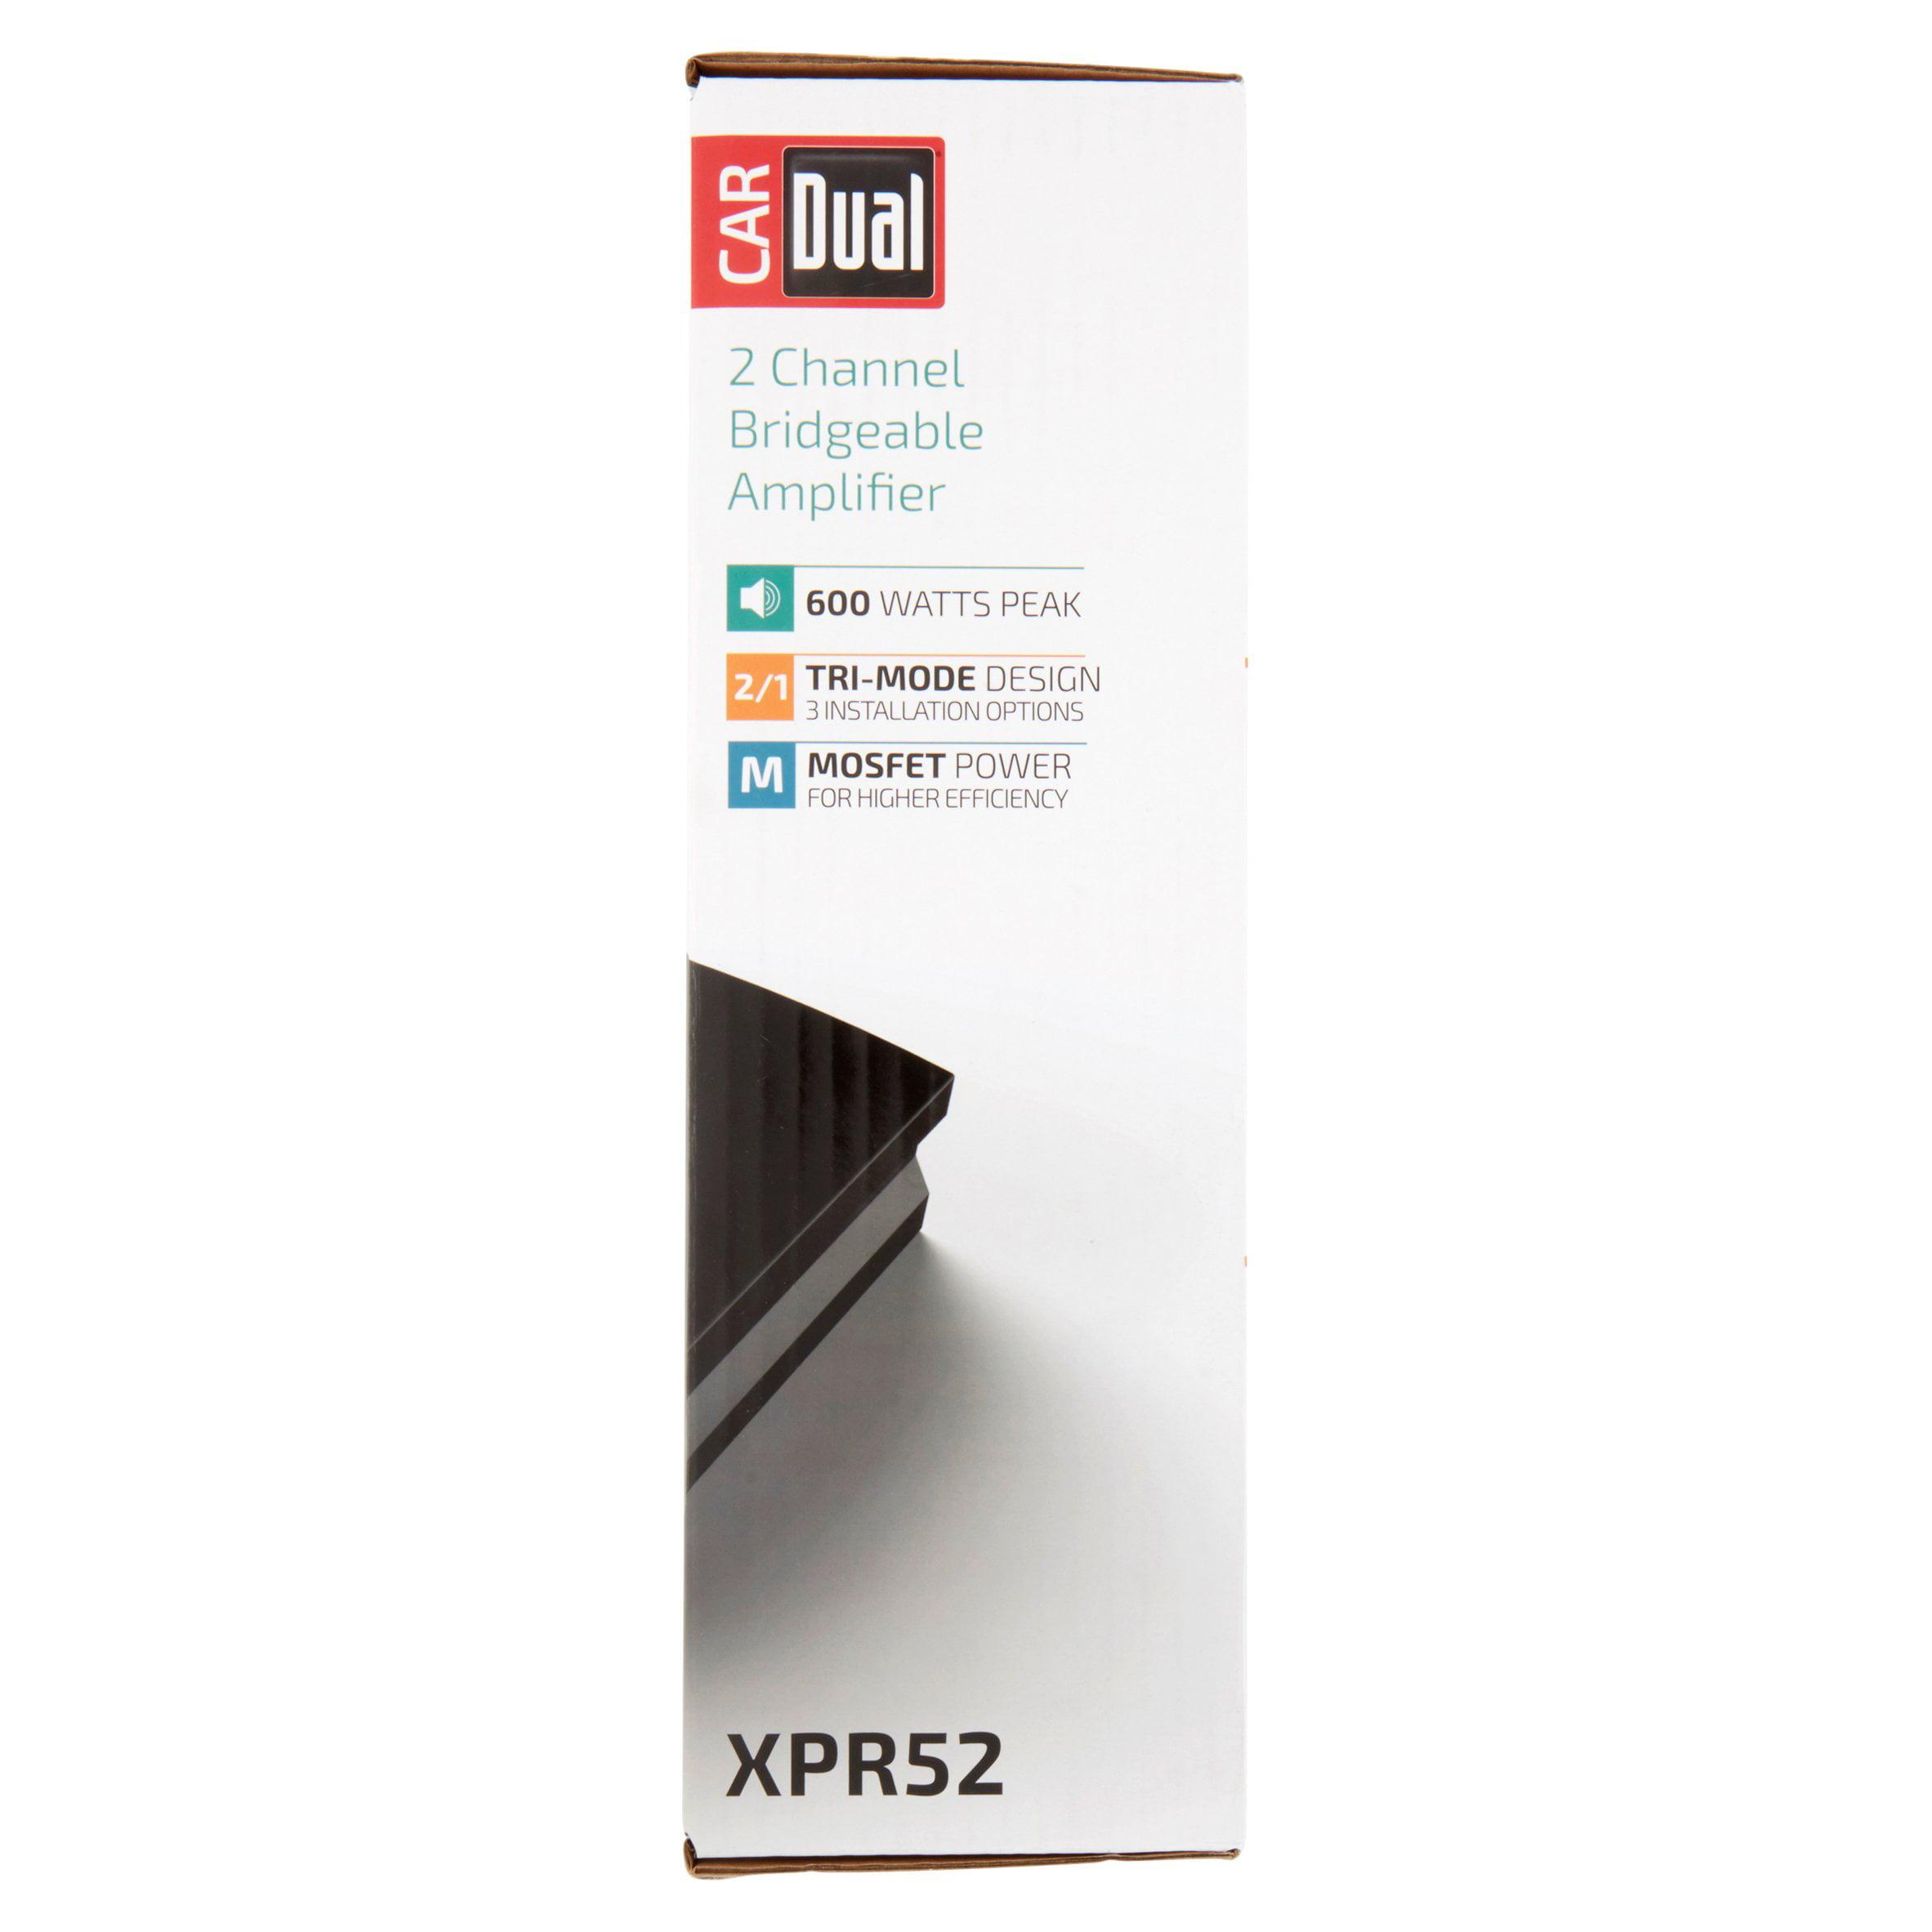 Dual Xpr52 2 Channel Bridgeable Amplifier Alpine Amp Bridged Wiring Diagram